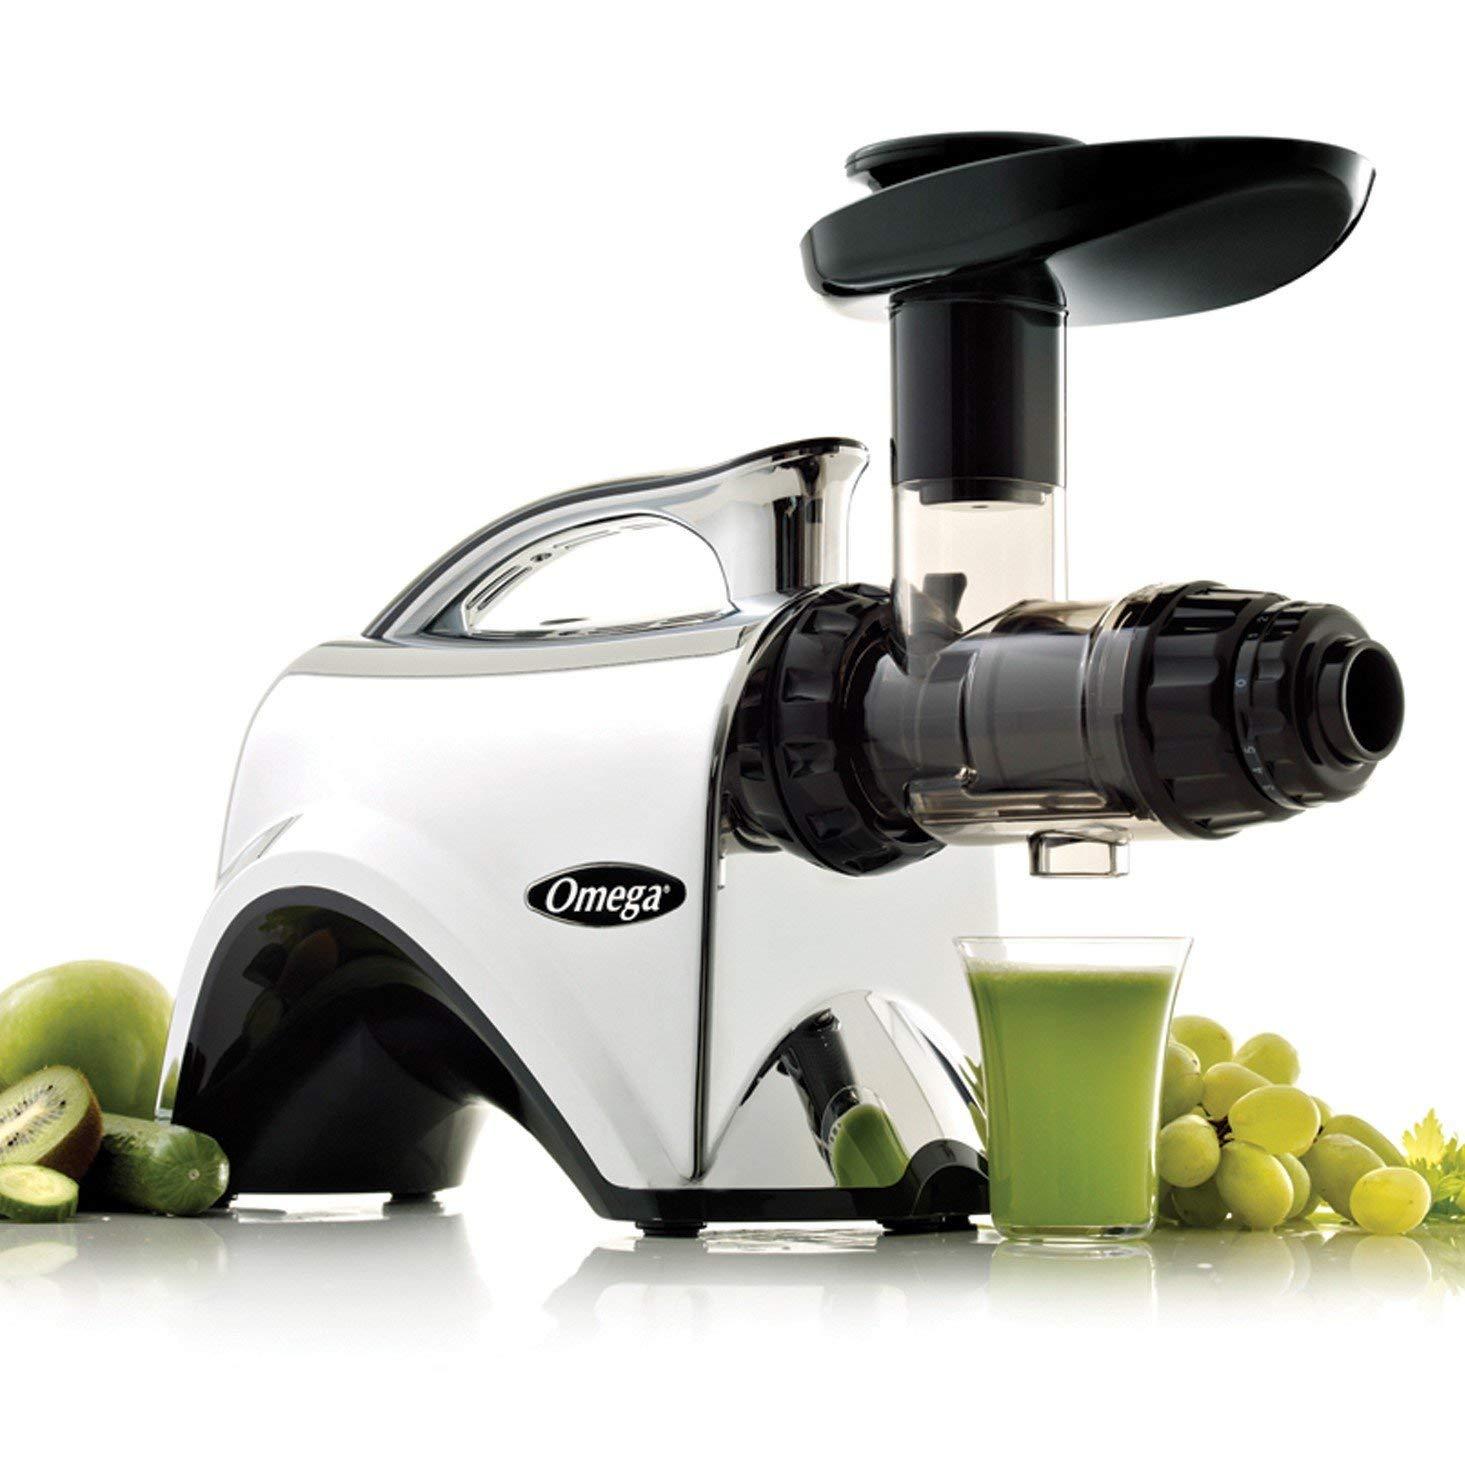 Omega Juicers NC900HDC Juicer Extractor Creates Fruit Vegetable Wheatgrass Juice Quiet Motor Slow Masticating Dual-Stage Extraction with Adjustable Settings, 150-Watt, Metallic (Renewed)